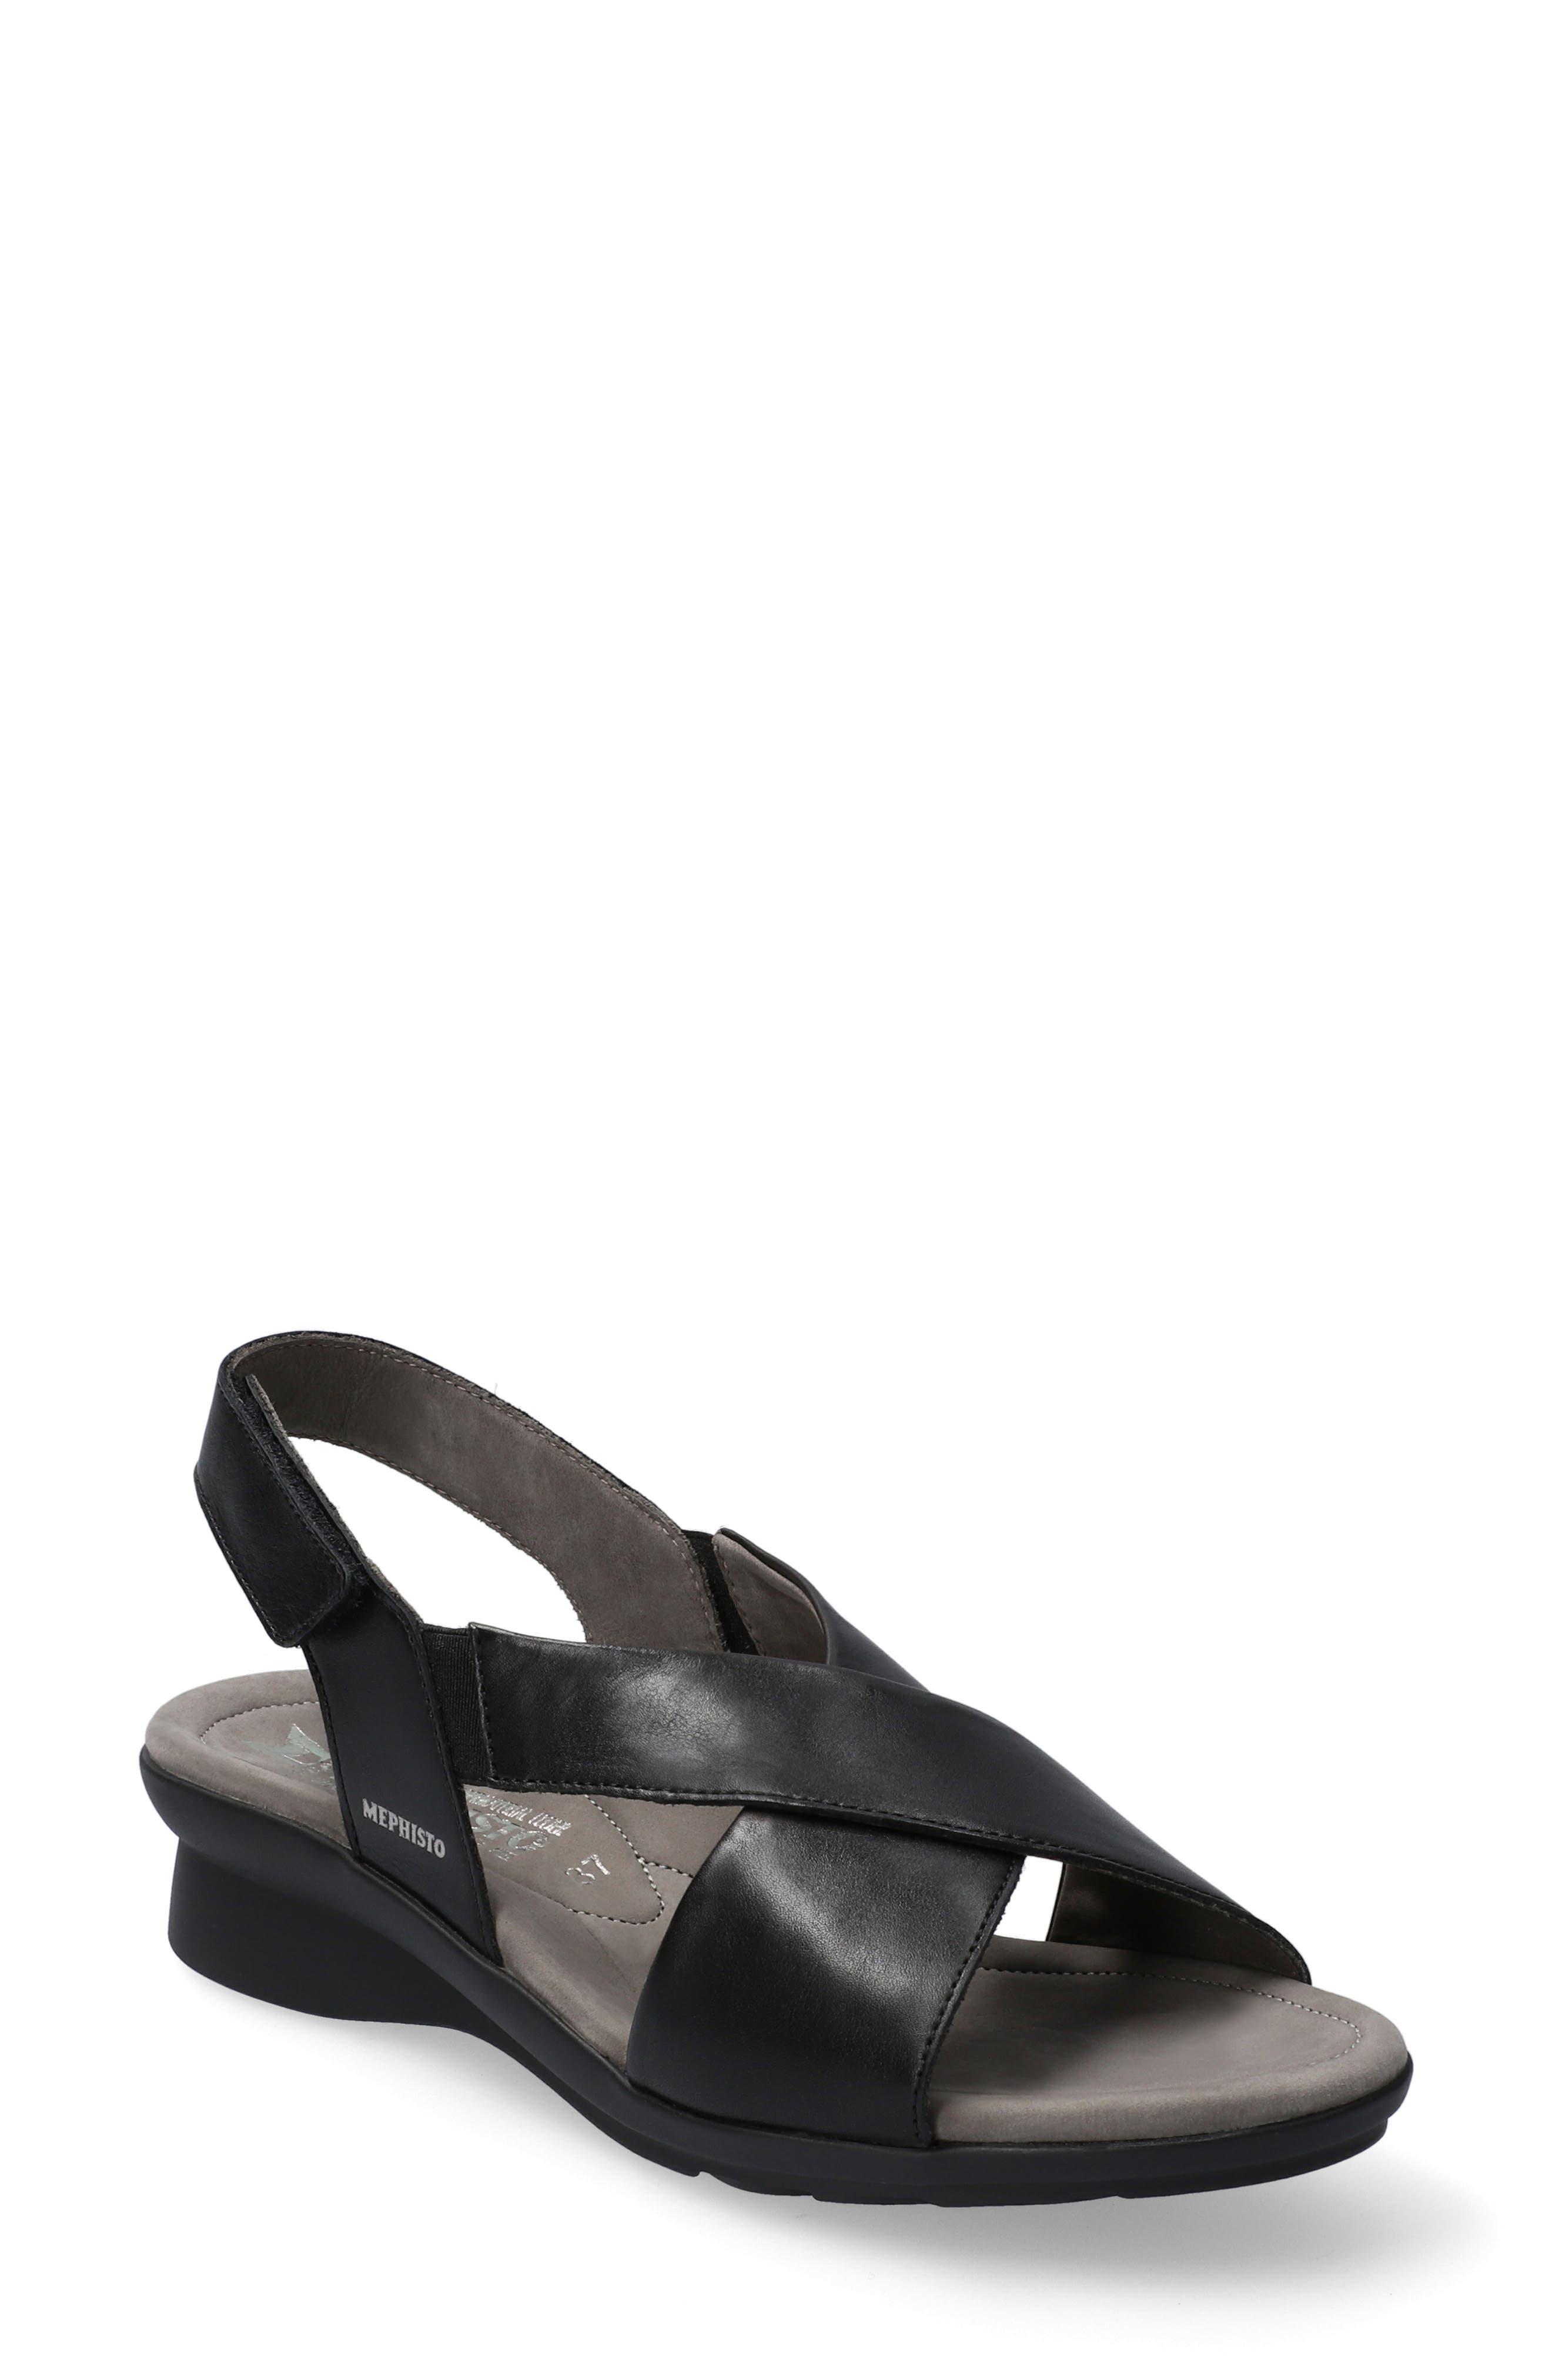 Phara Wedge Sandal